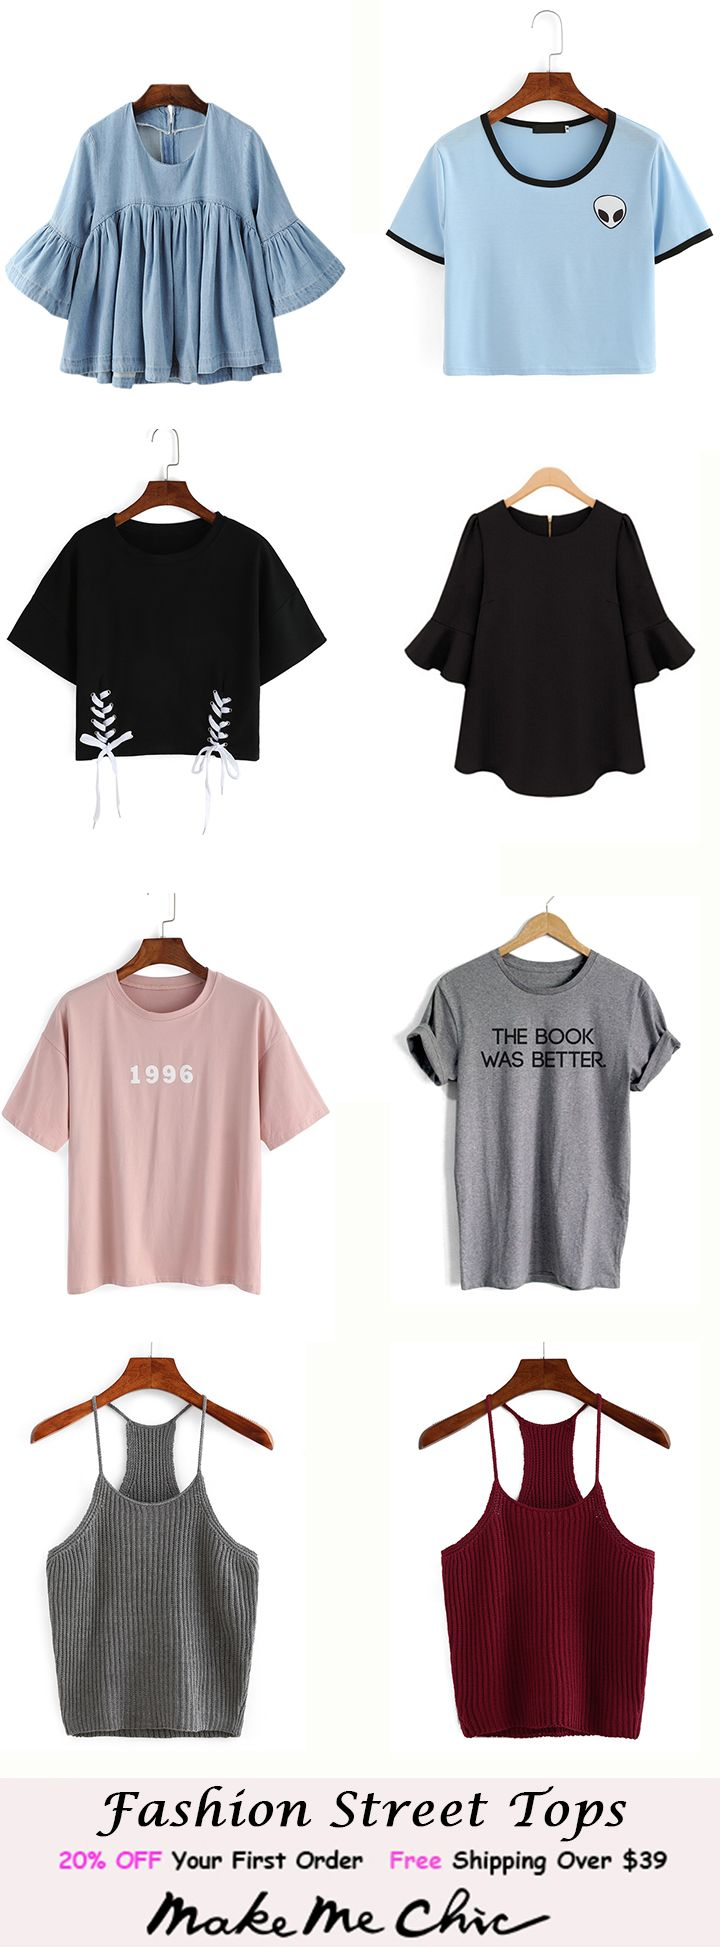 Fashion Street Tops